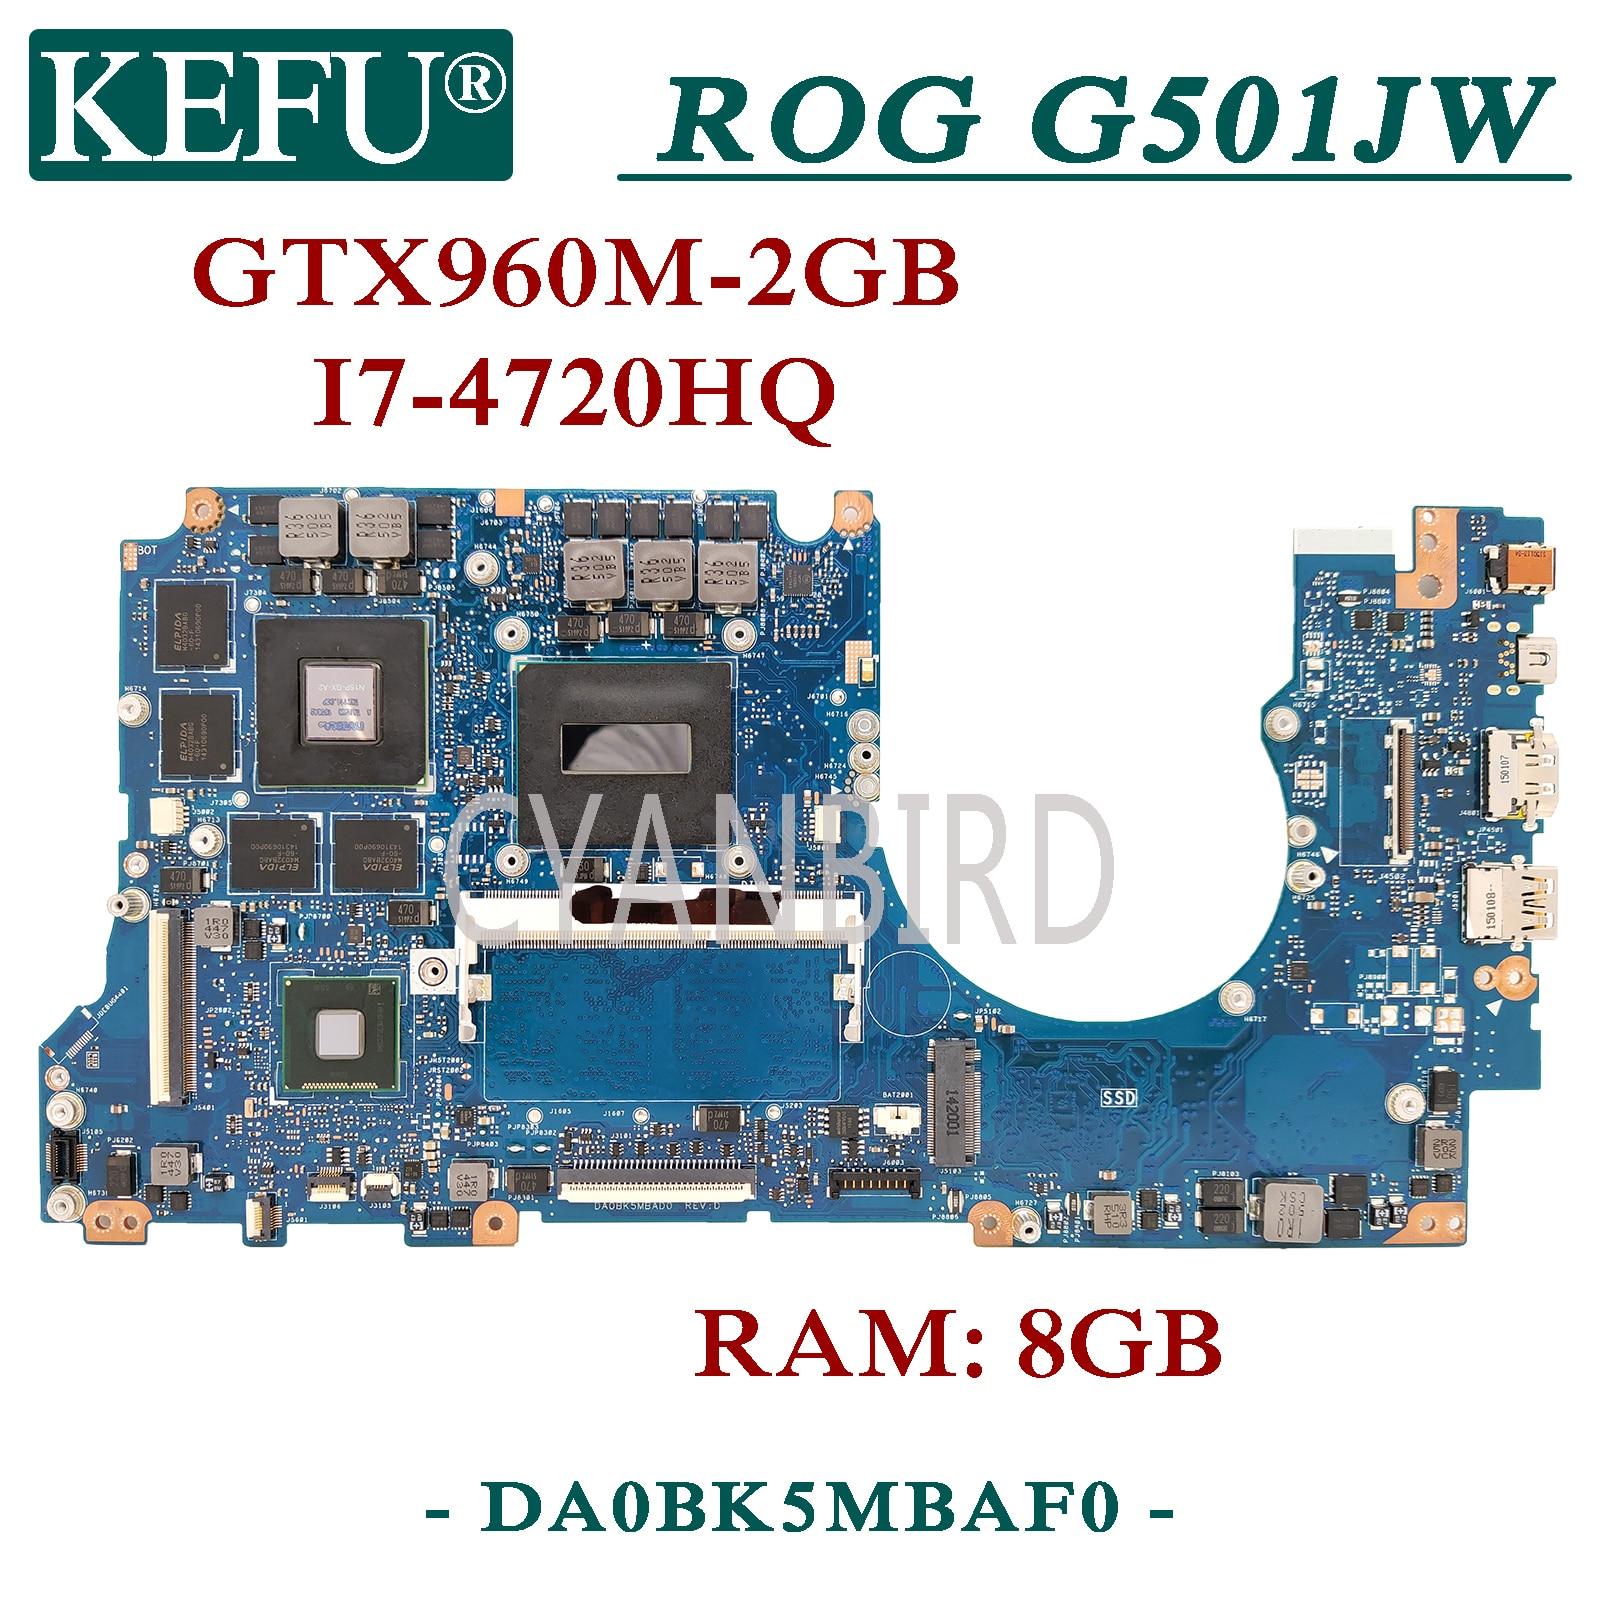 KEFU DA0BK5MBAF0 الأصلي اللوحة الرئيسية ل ASUS ROG G501JW G501J N501JW N501J مع 8GB-RAM I7-4720HQ GTX960M-2GB اللوحة الأم للكمبيوتر المحمول